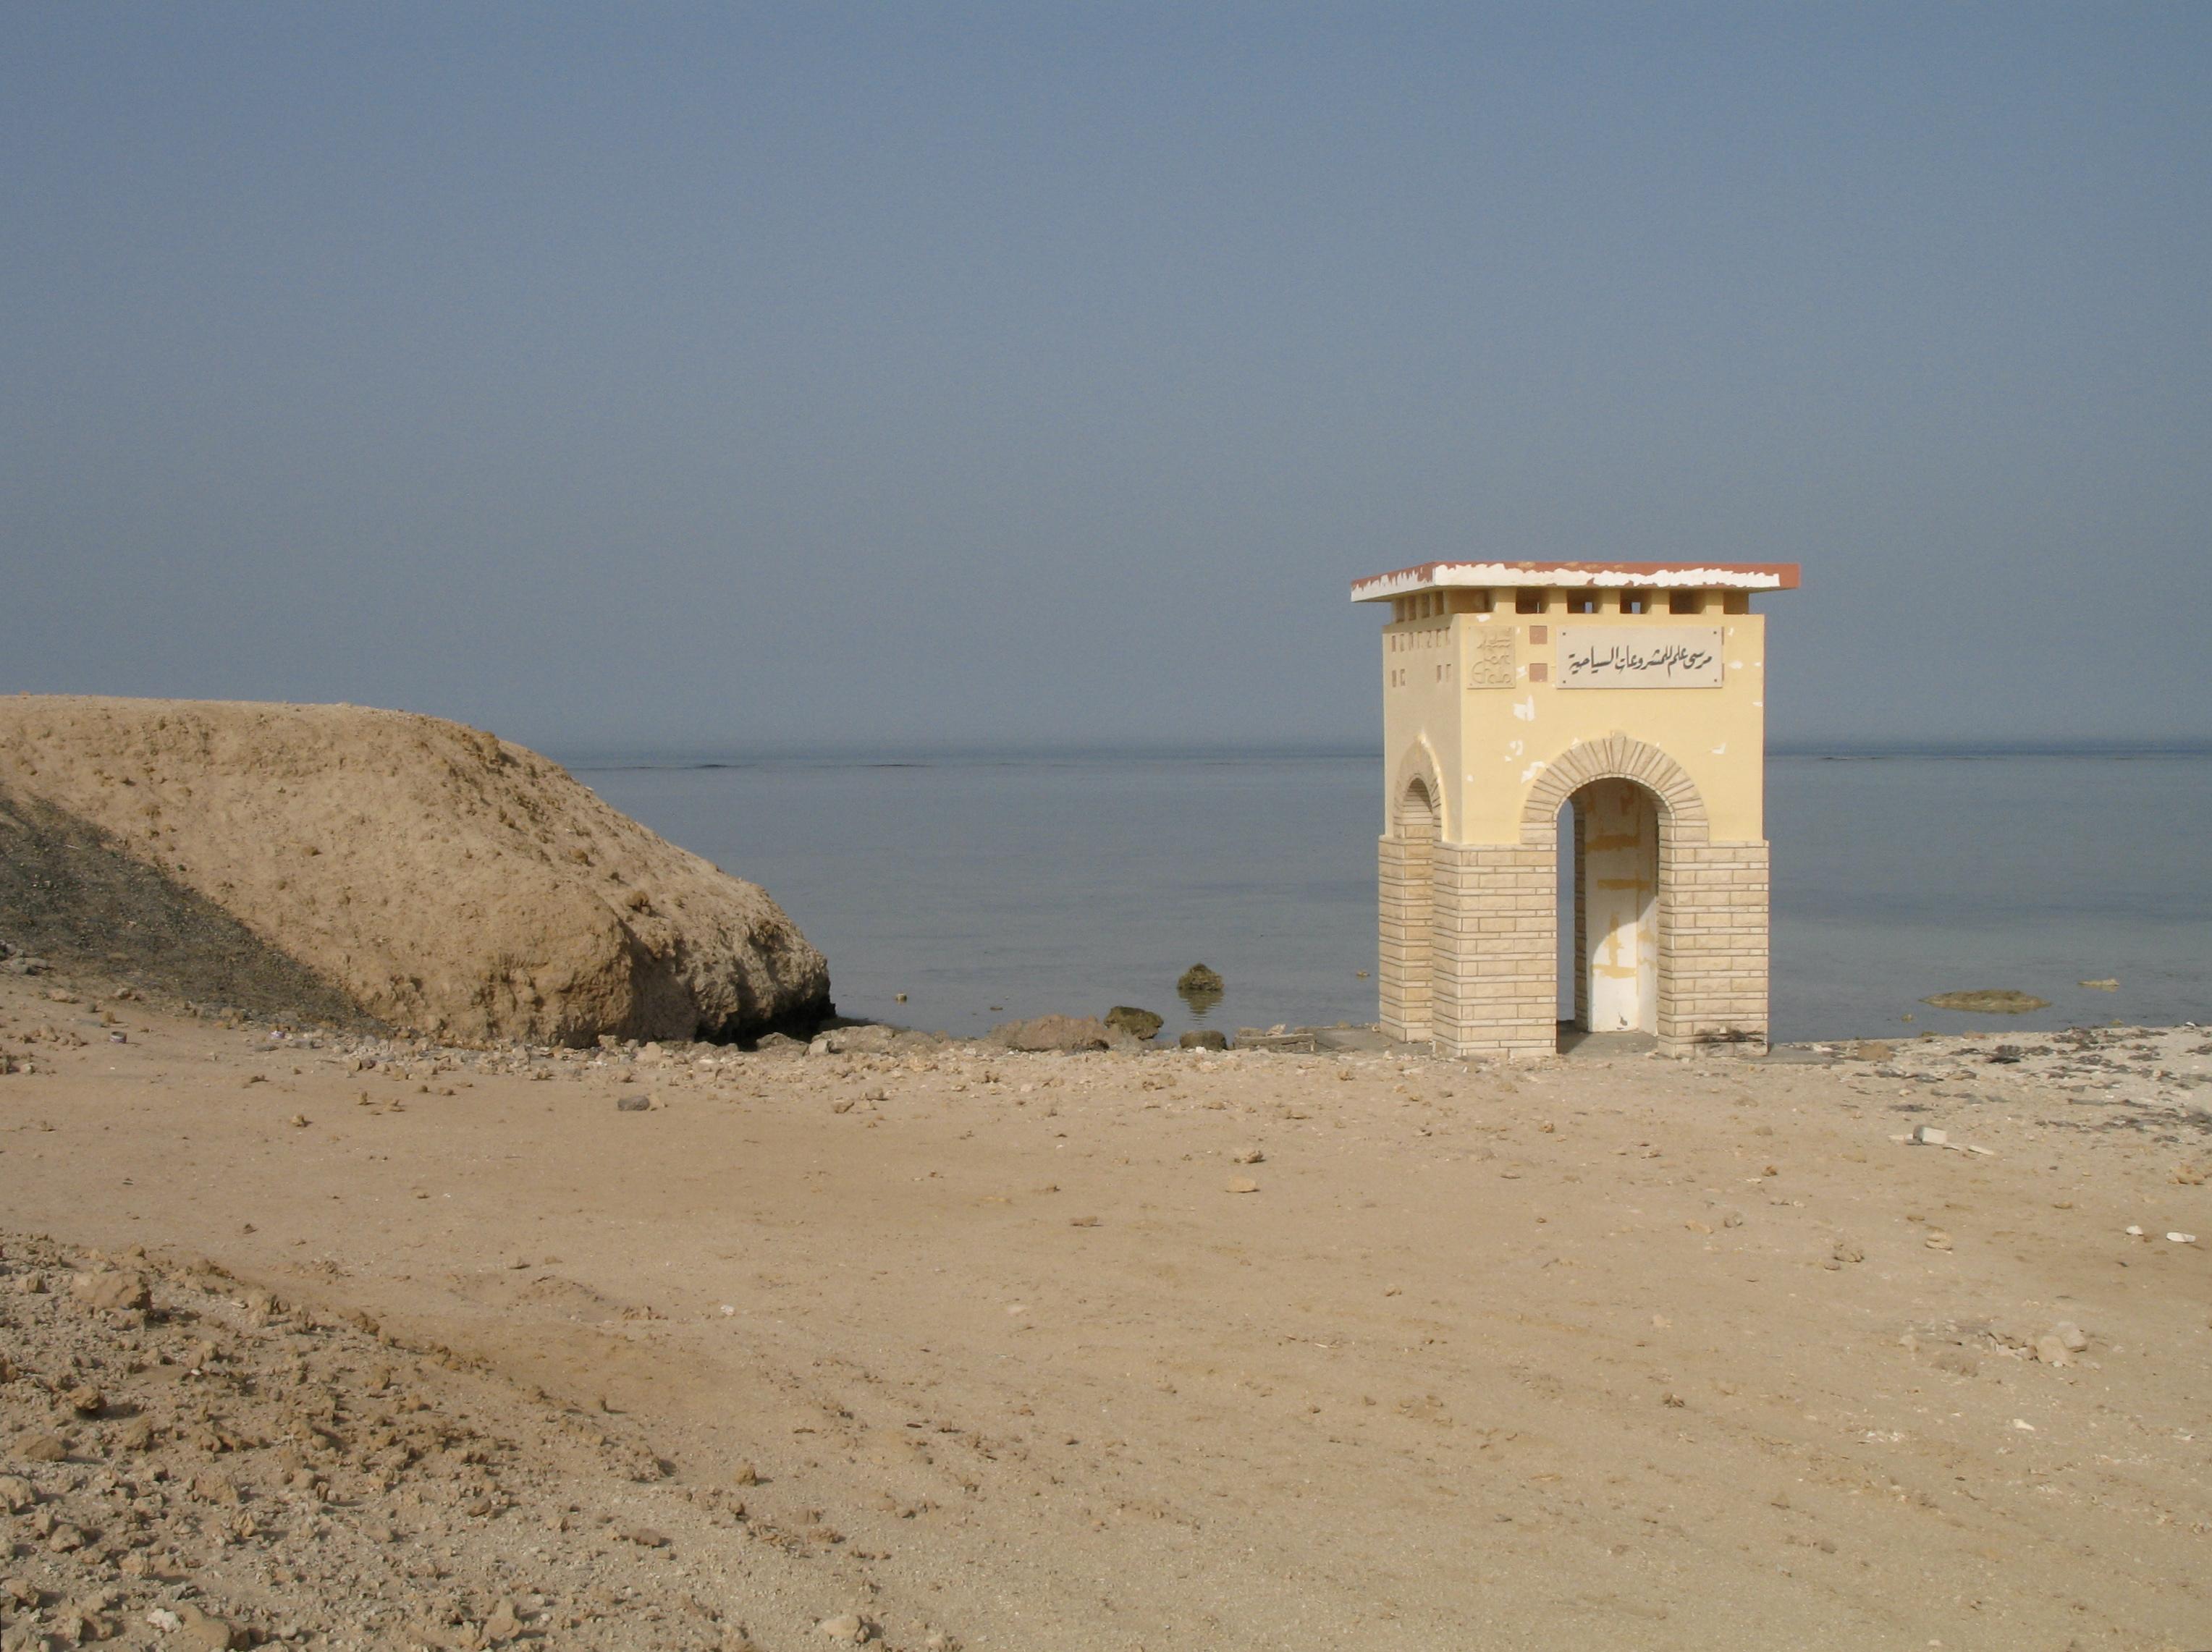 Marsa Alam Egypt  City new picture : marsa `alam, Al Bahr al Ahmar, Egypt What happens in marsa `alam ...